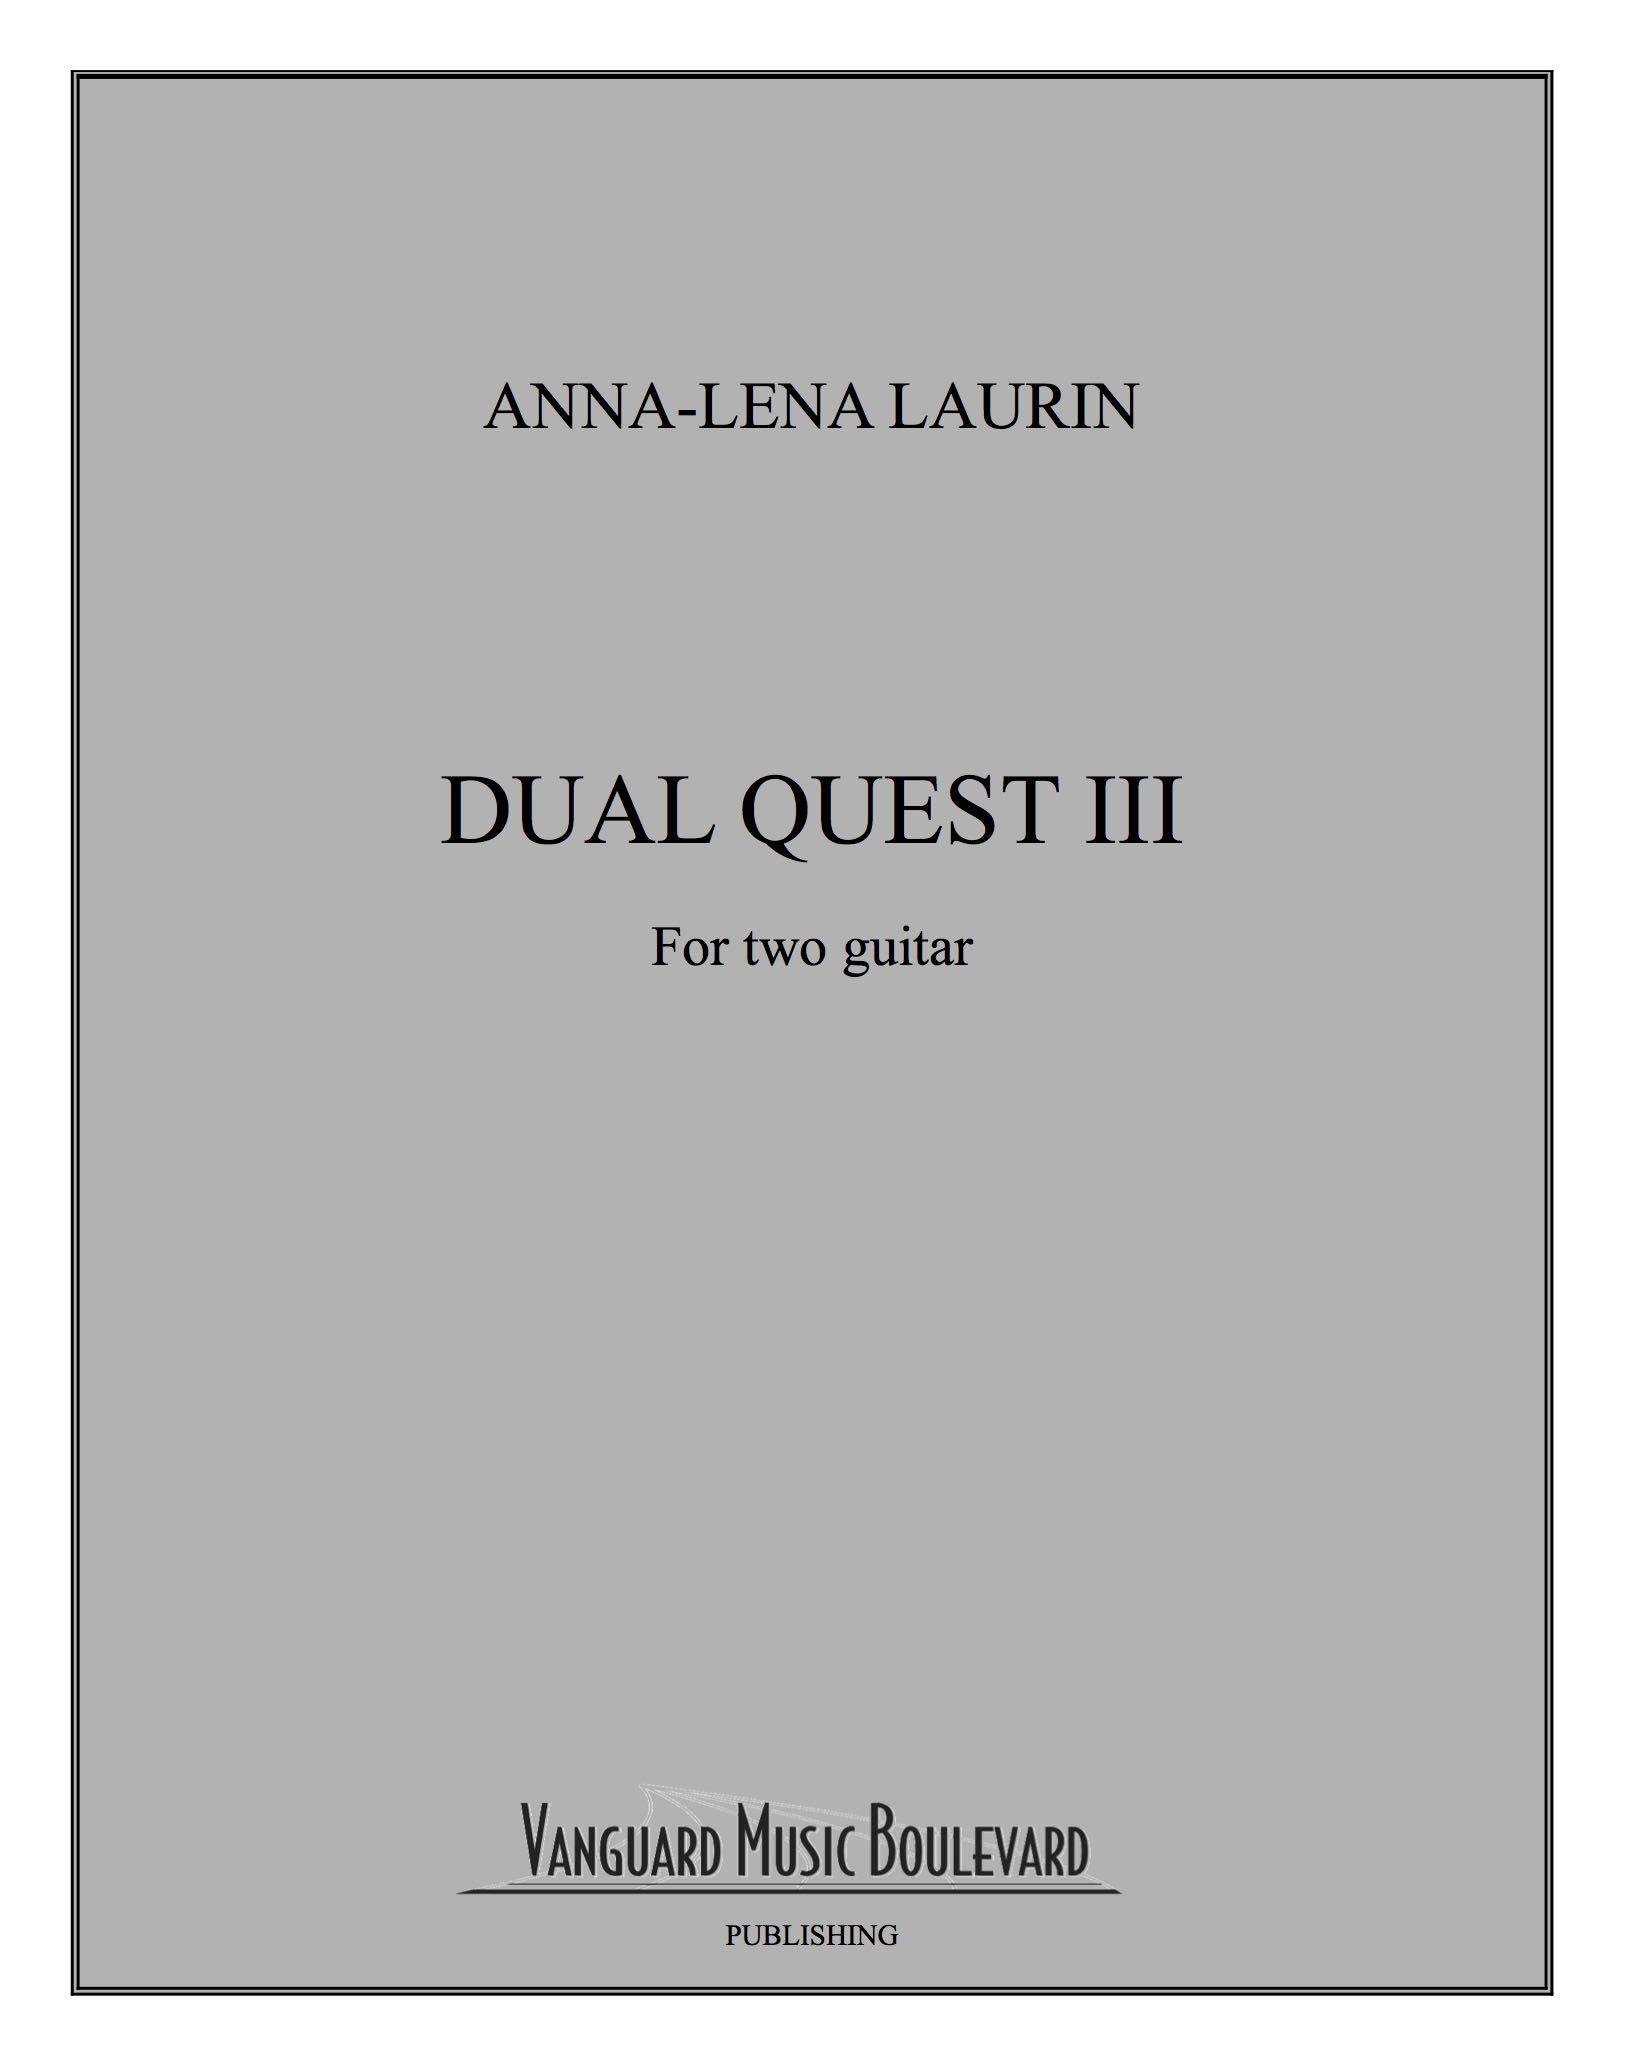 Dual Quest III